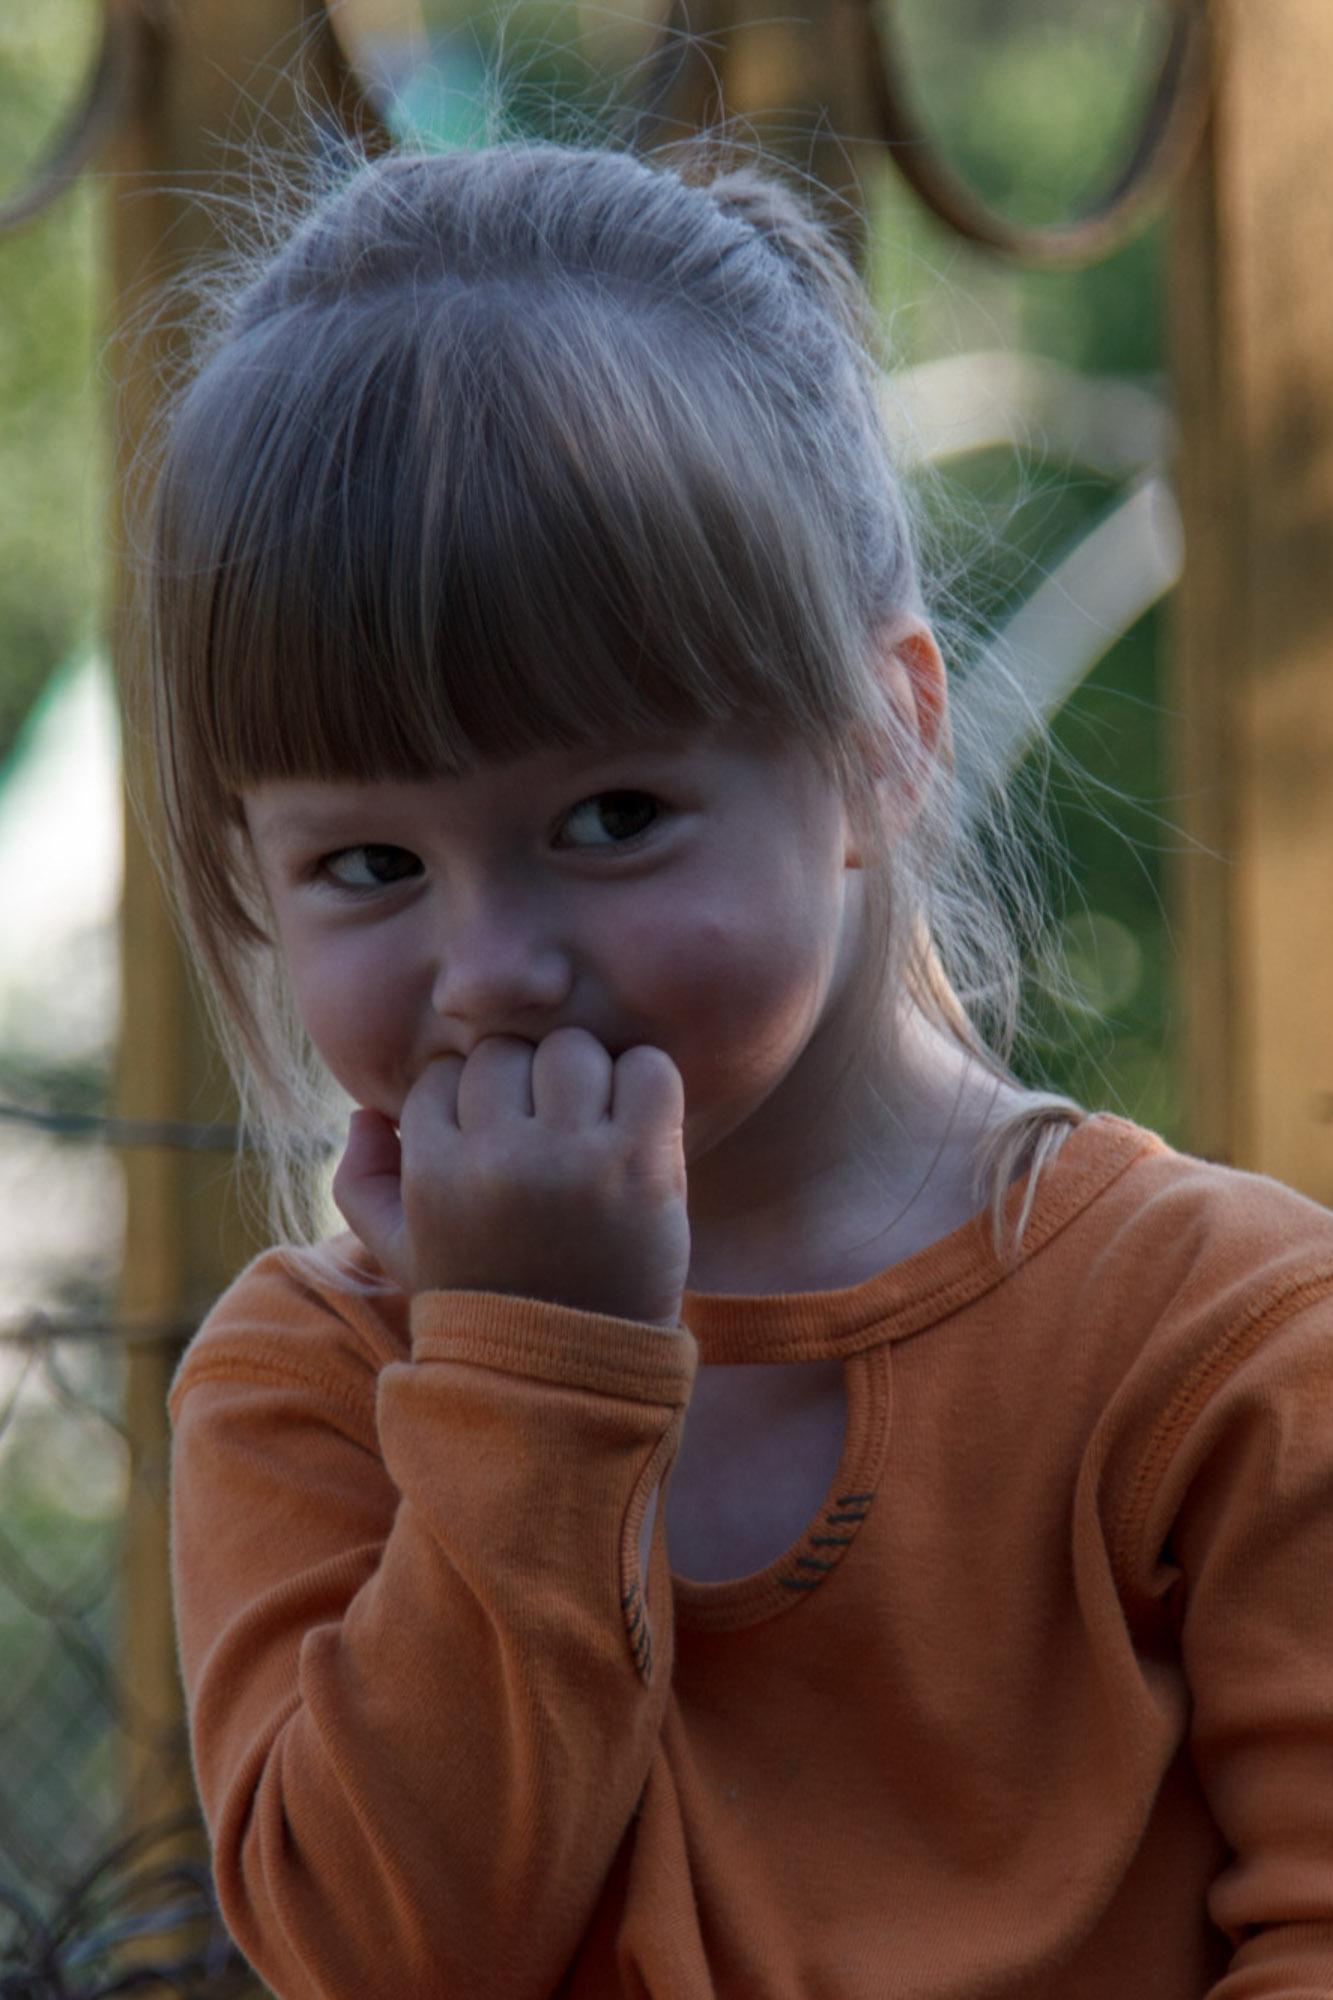 Характер ребенка и его развитие